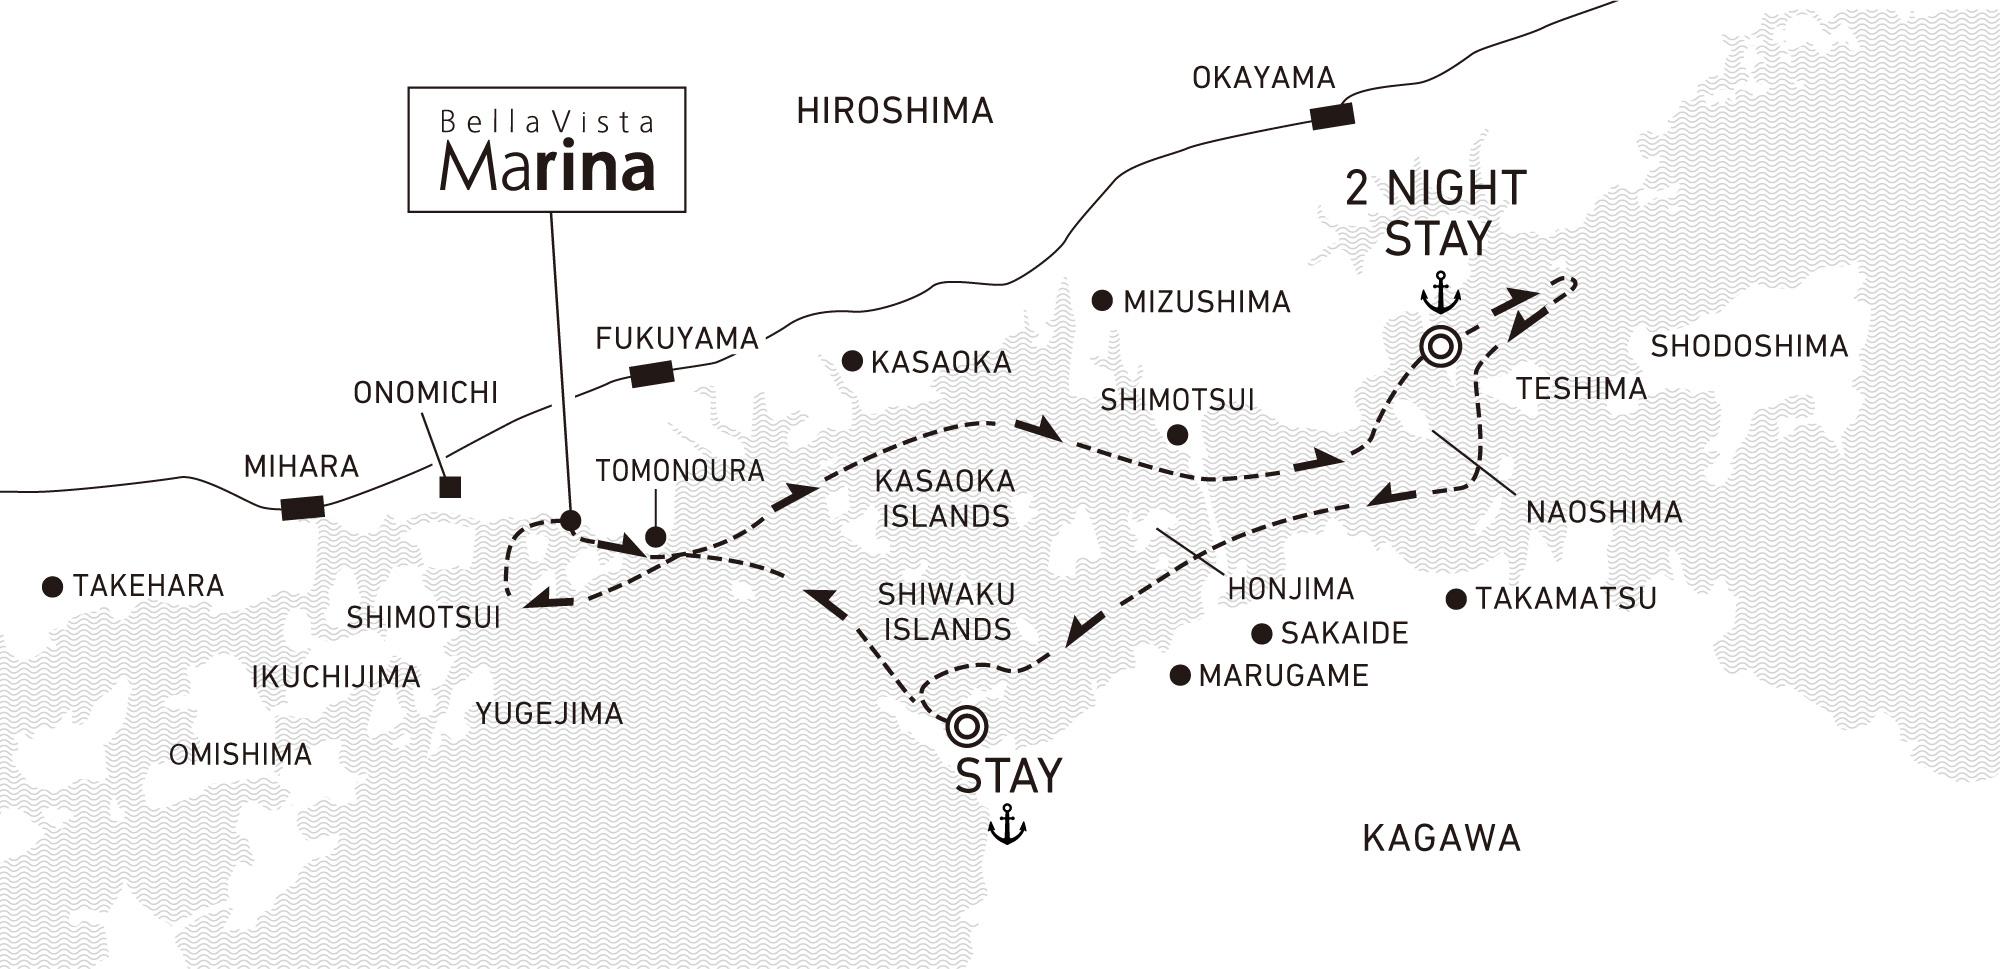 A four-day voyage to enjoy Setouchi art island-hopping 3 nights / anchor offshore at Tamano, Tamano and Takuma Bay (For 2022)